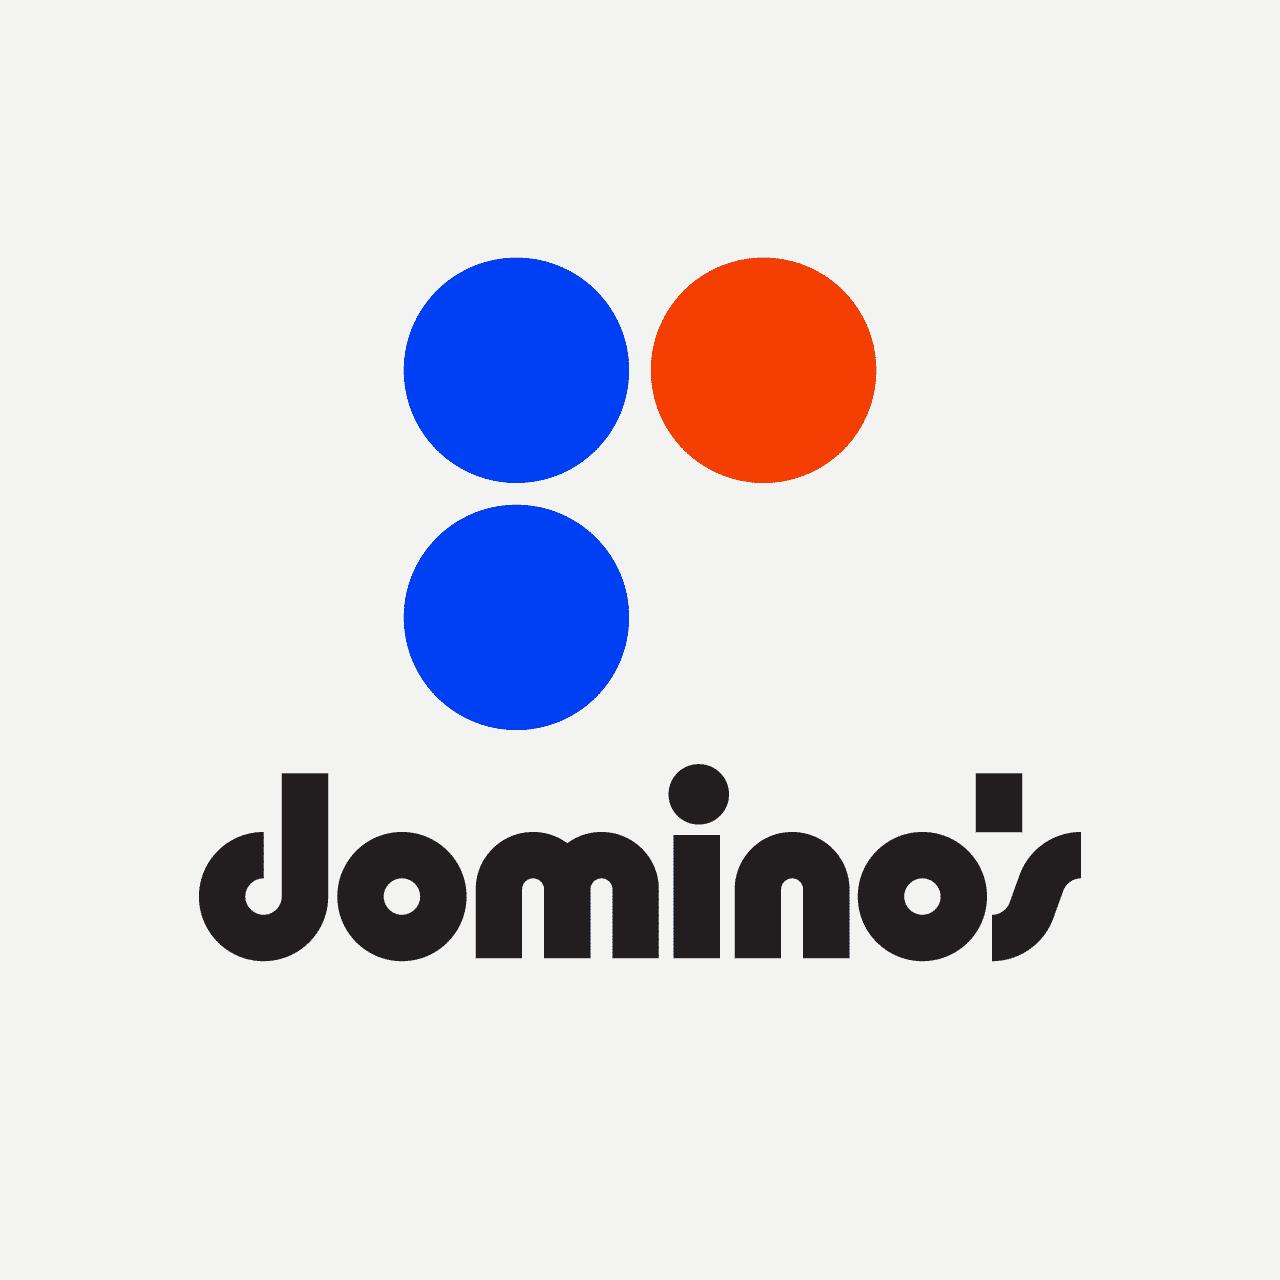 dominos vintage logo rafael serra